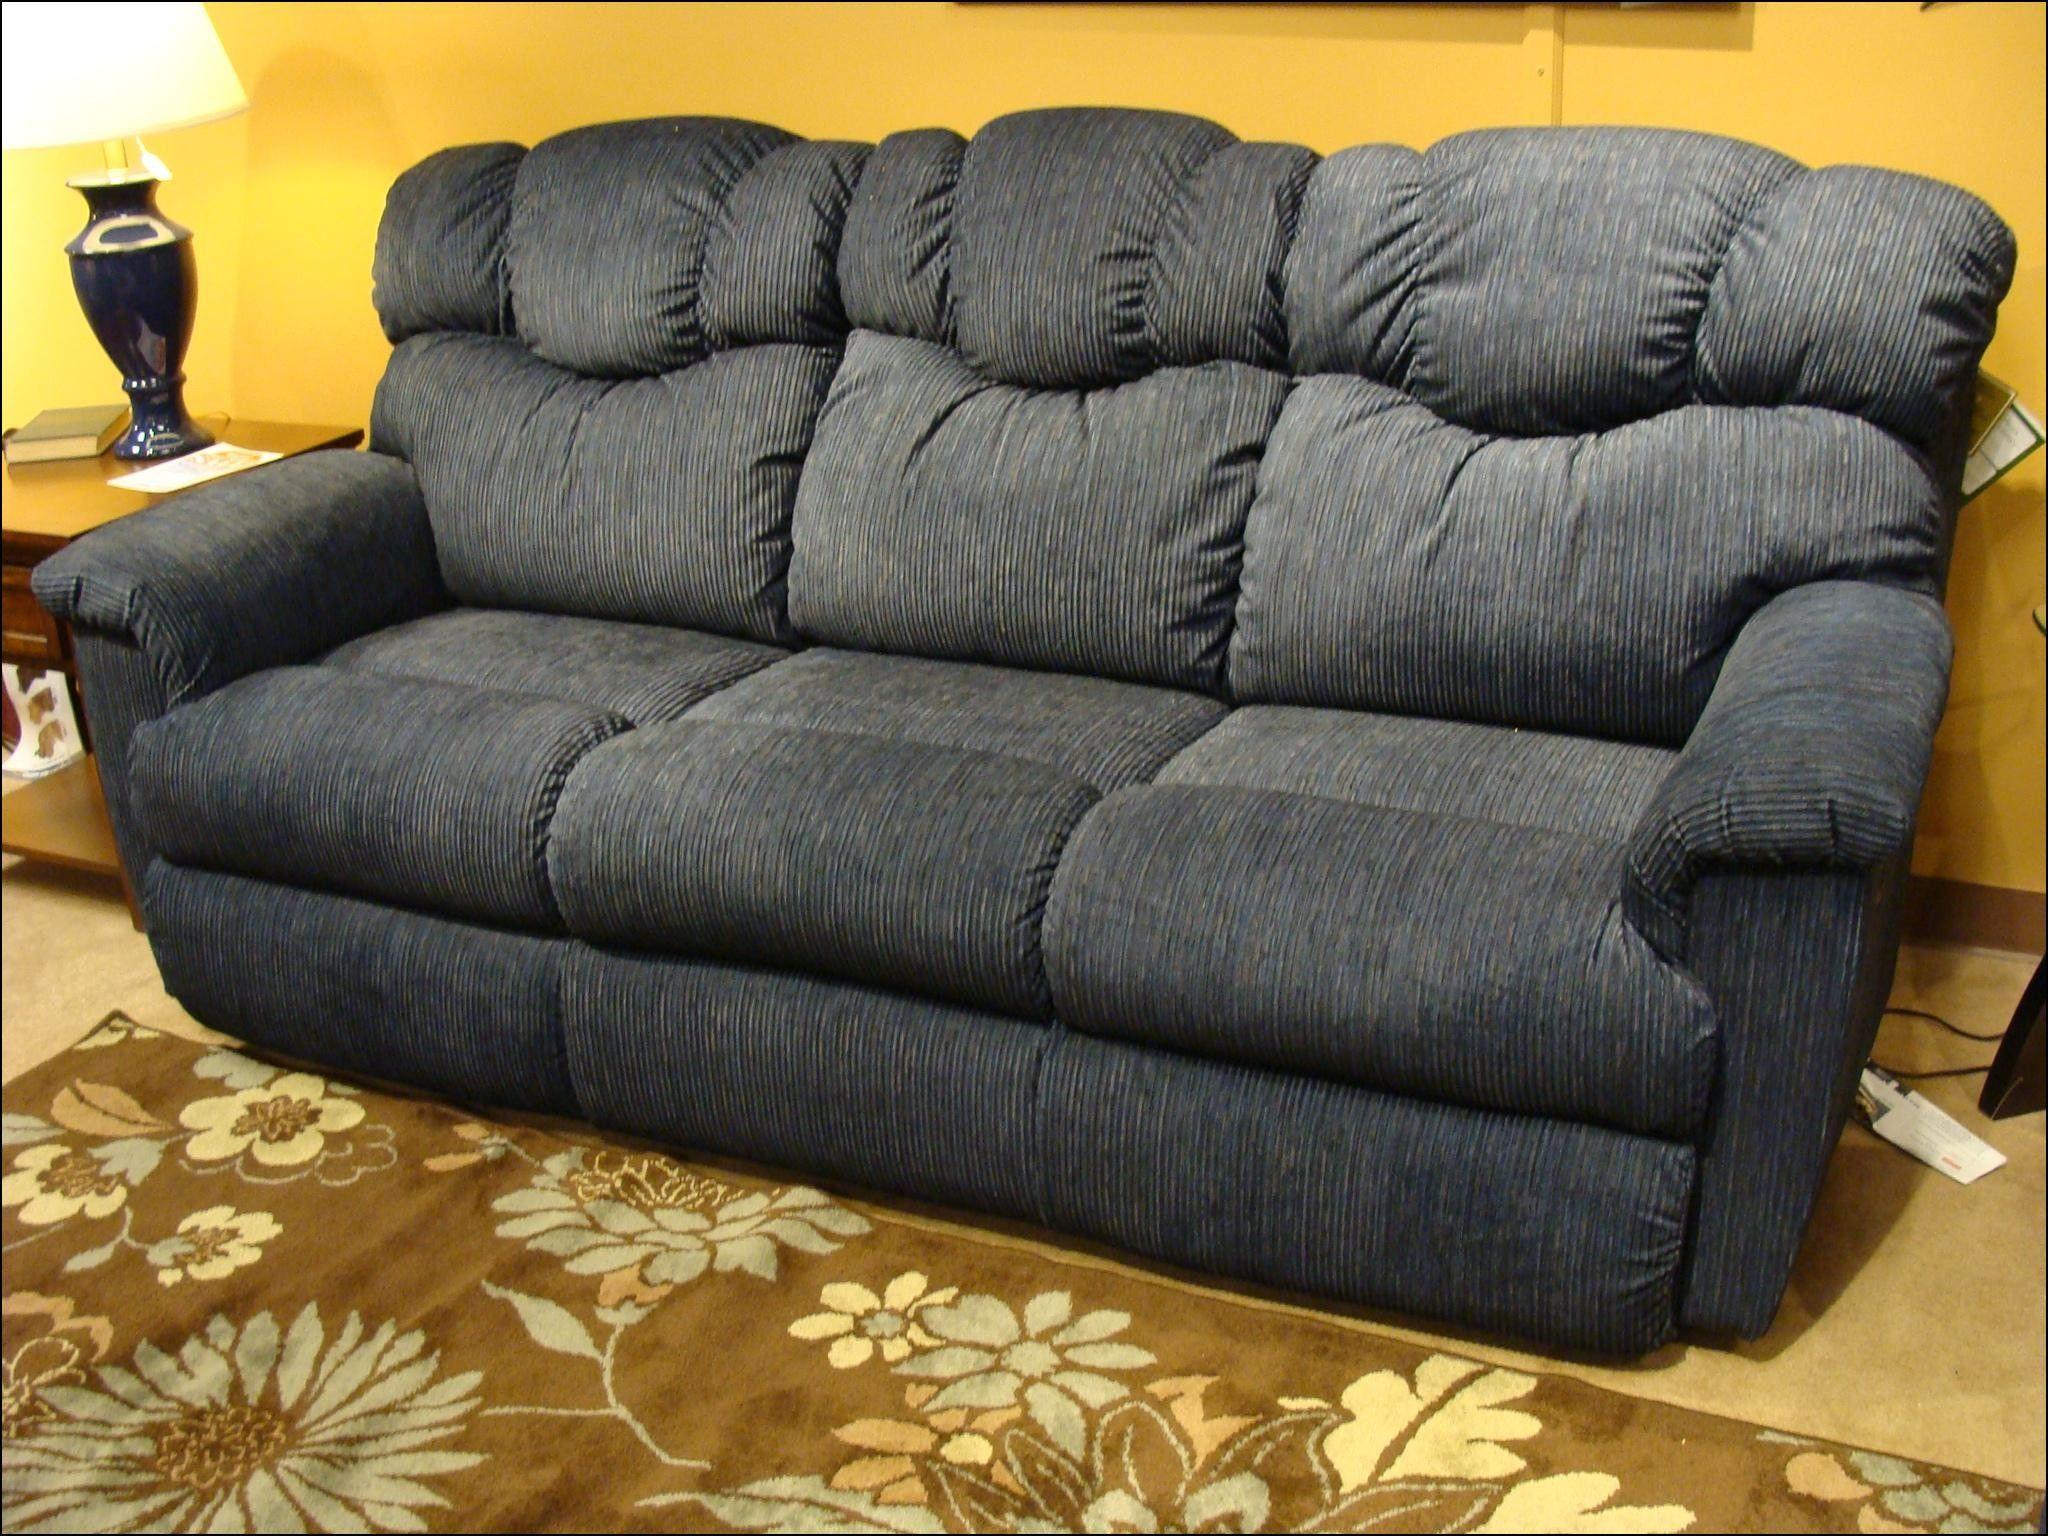 Lazy Boy Lancer sofa Lazy boy sofas, Sofa, Sofa bed mattress